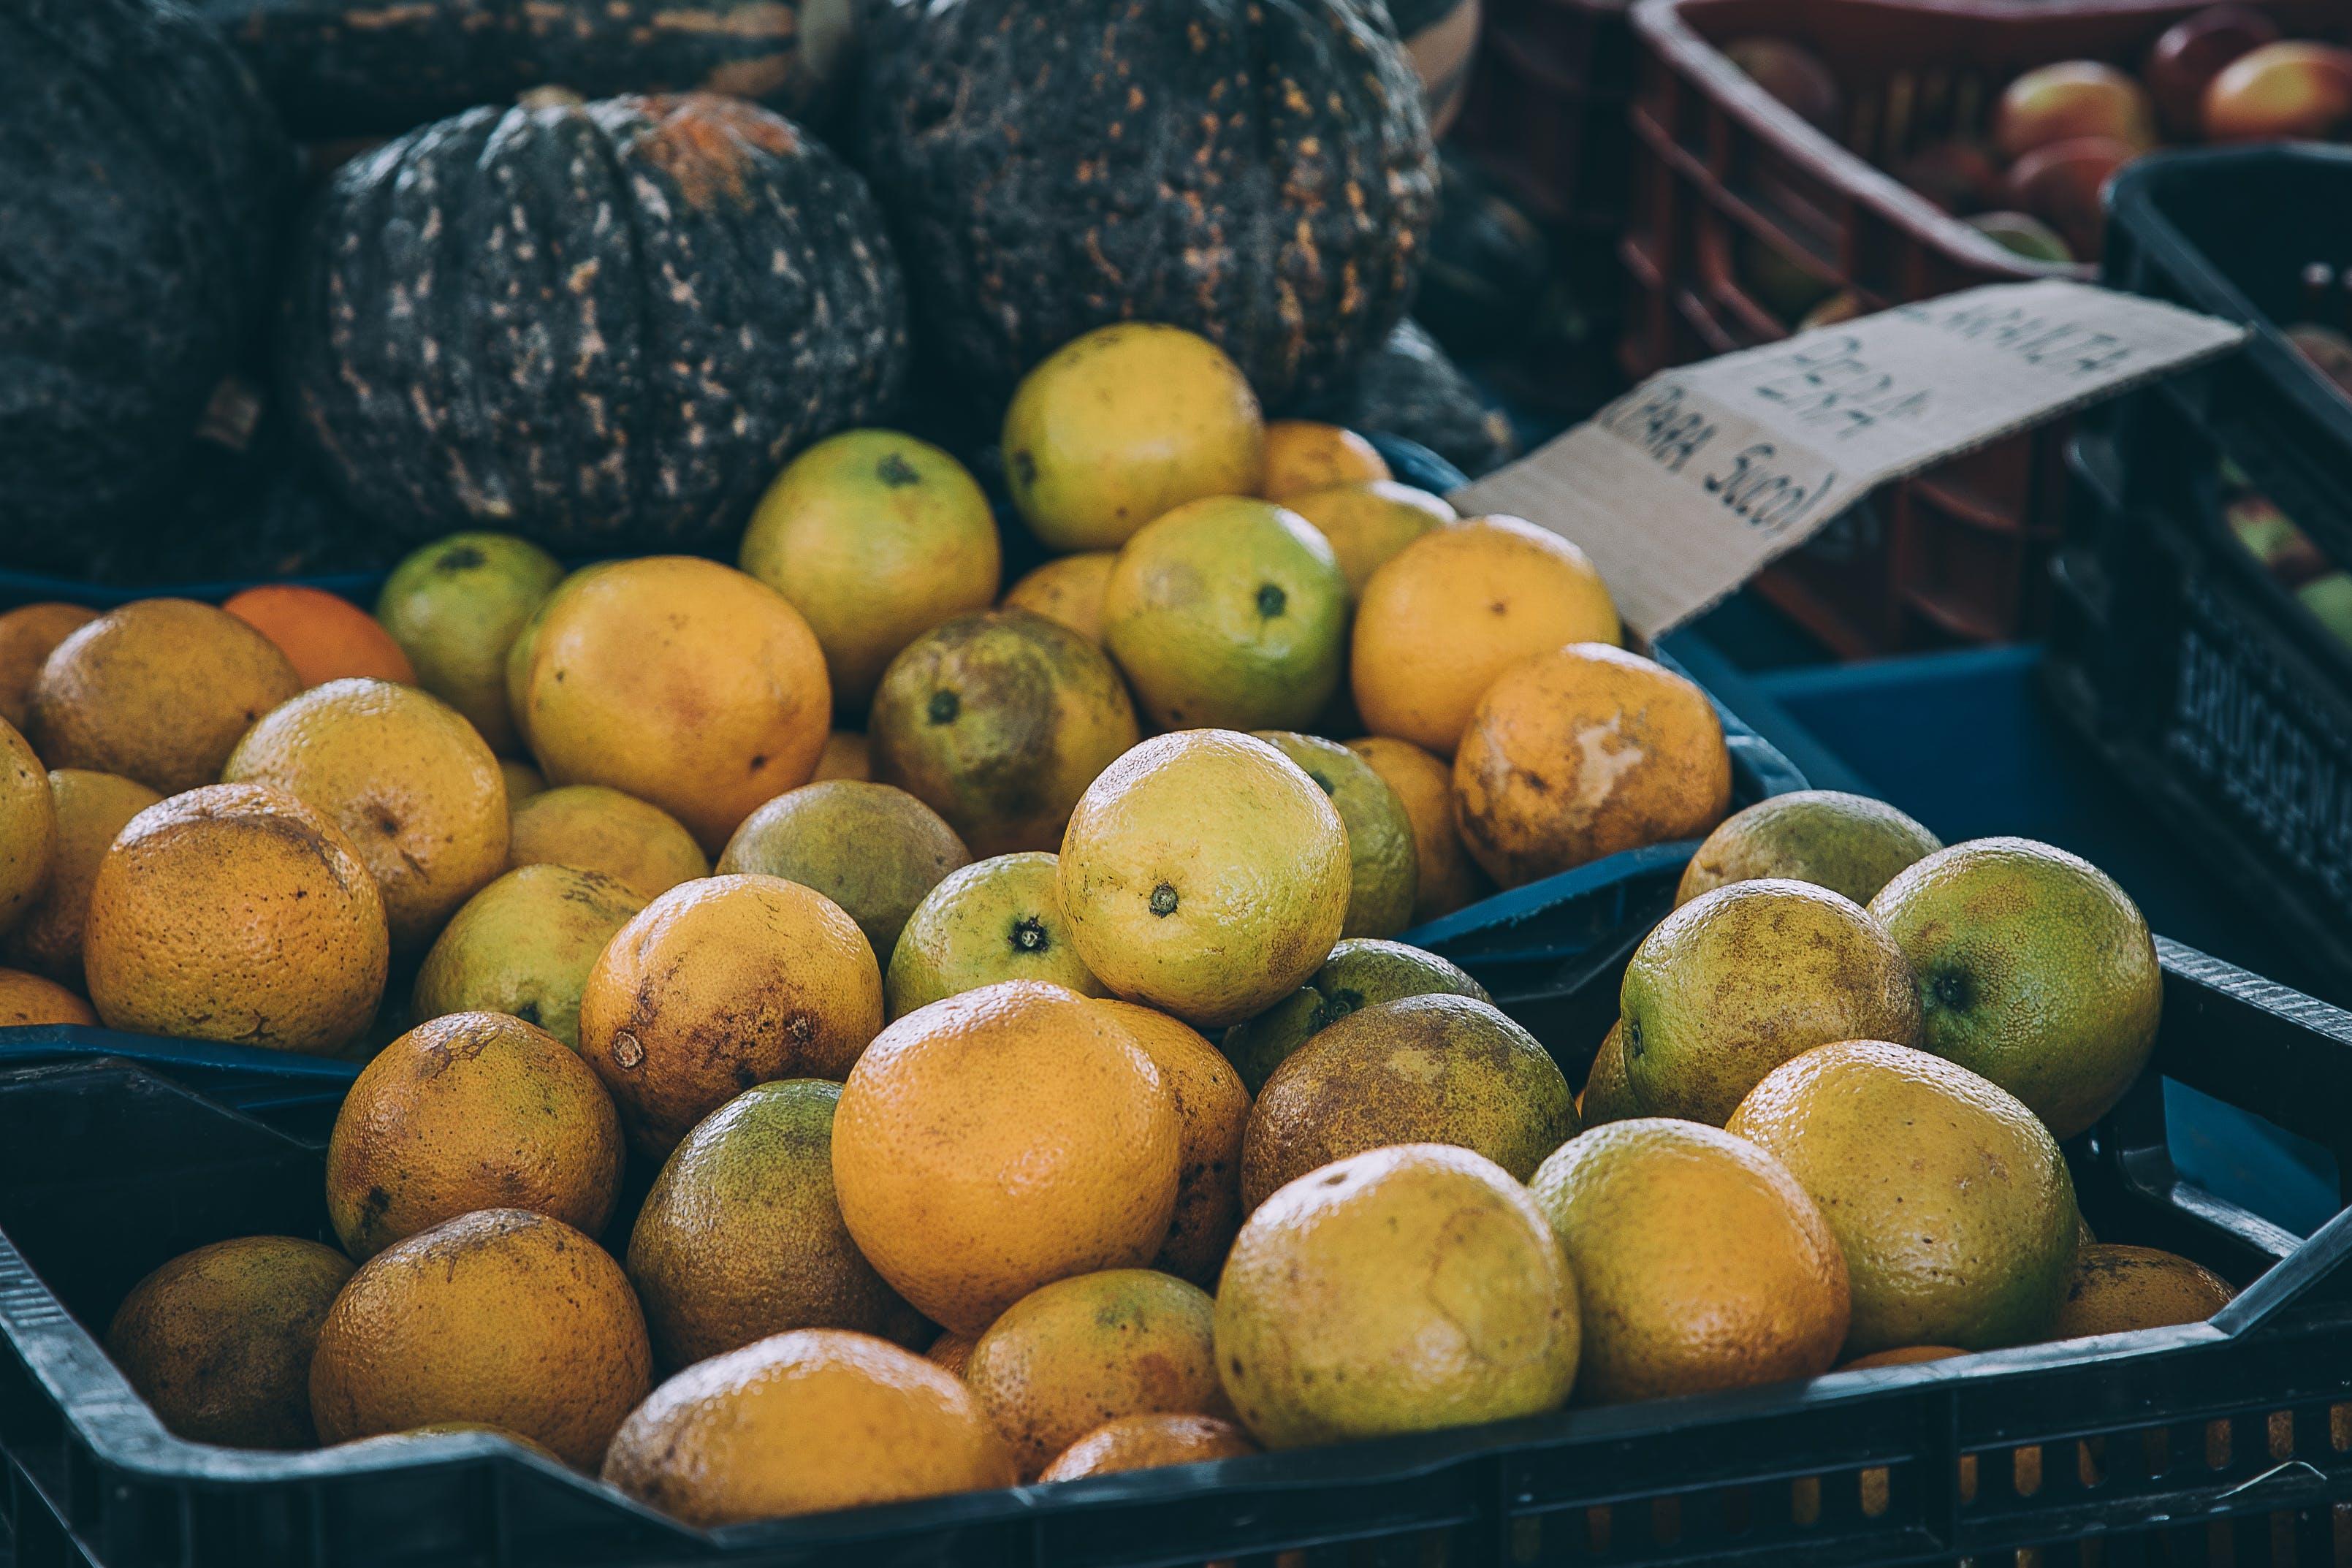 Photo of Orange Fruits in Trays